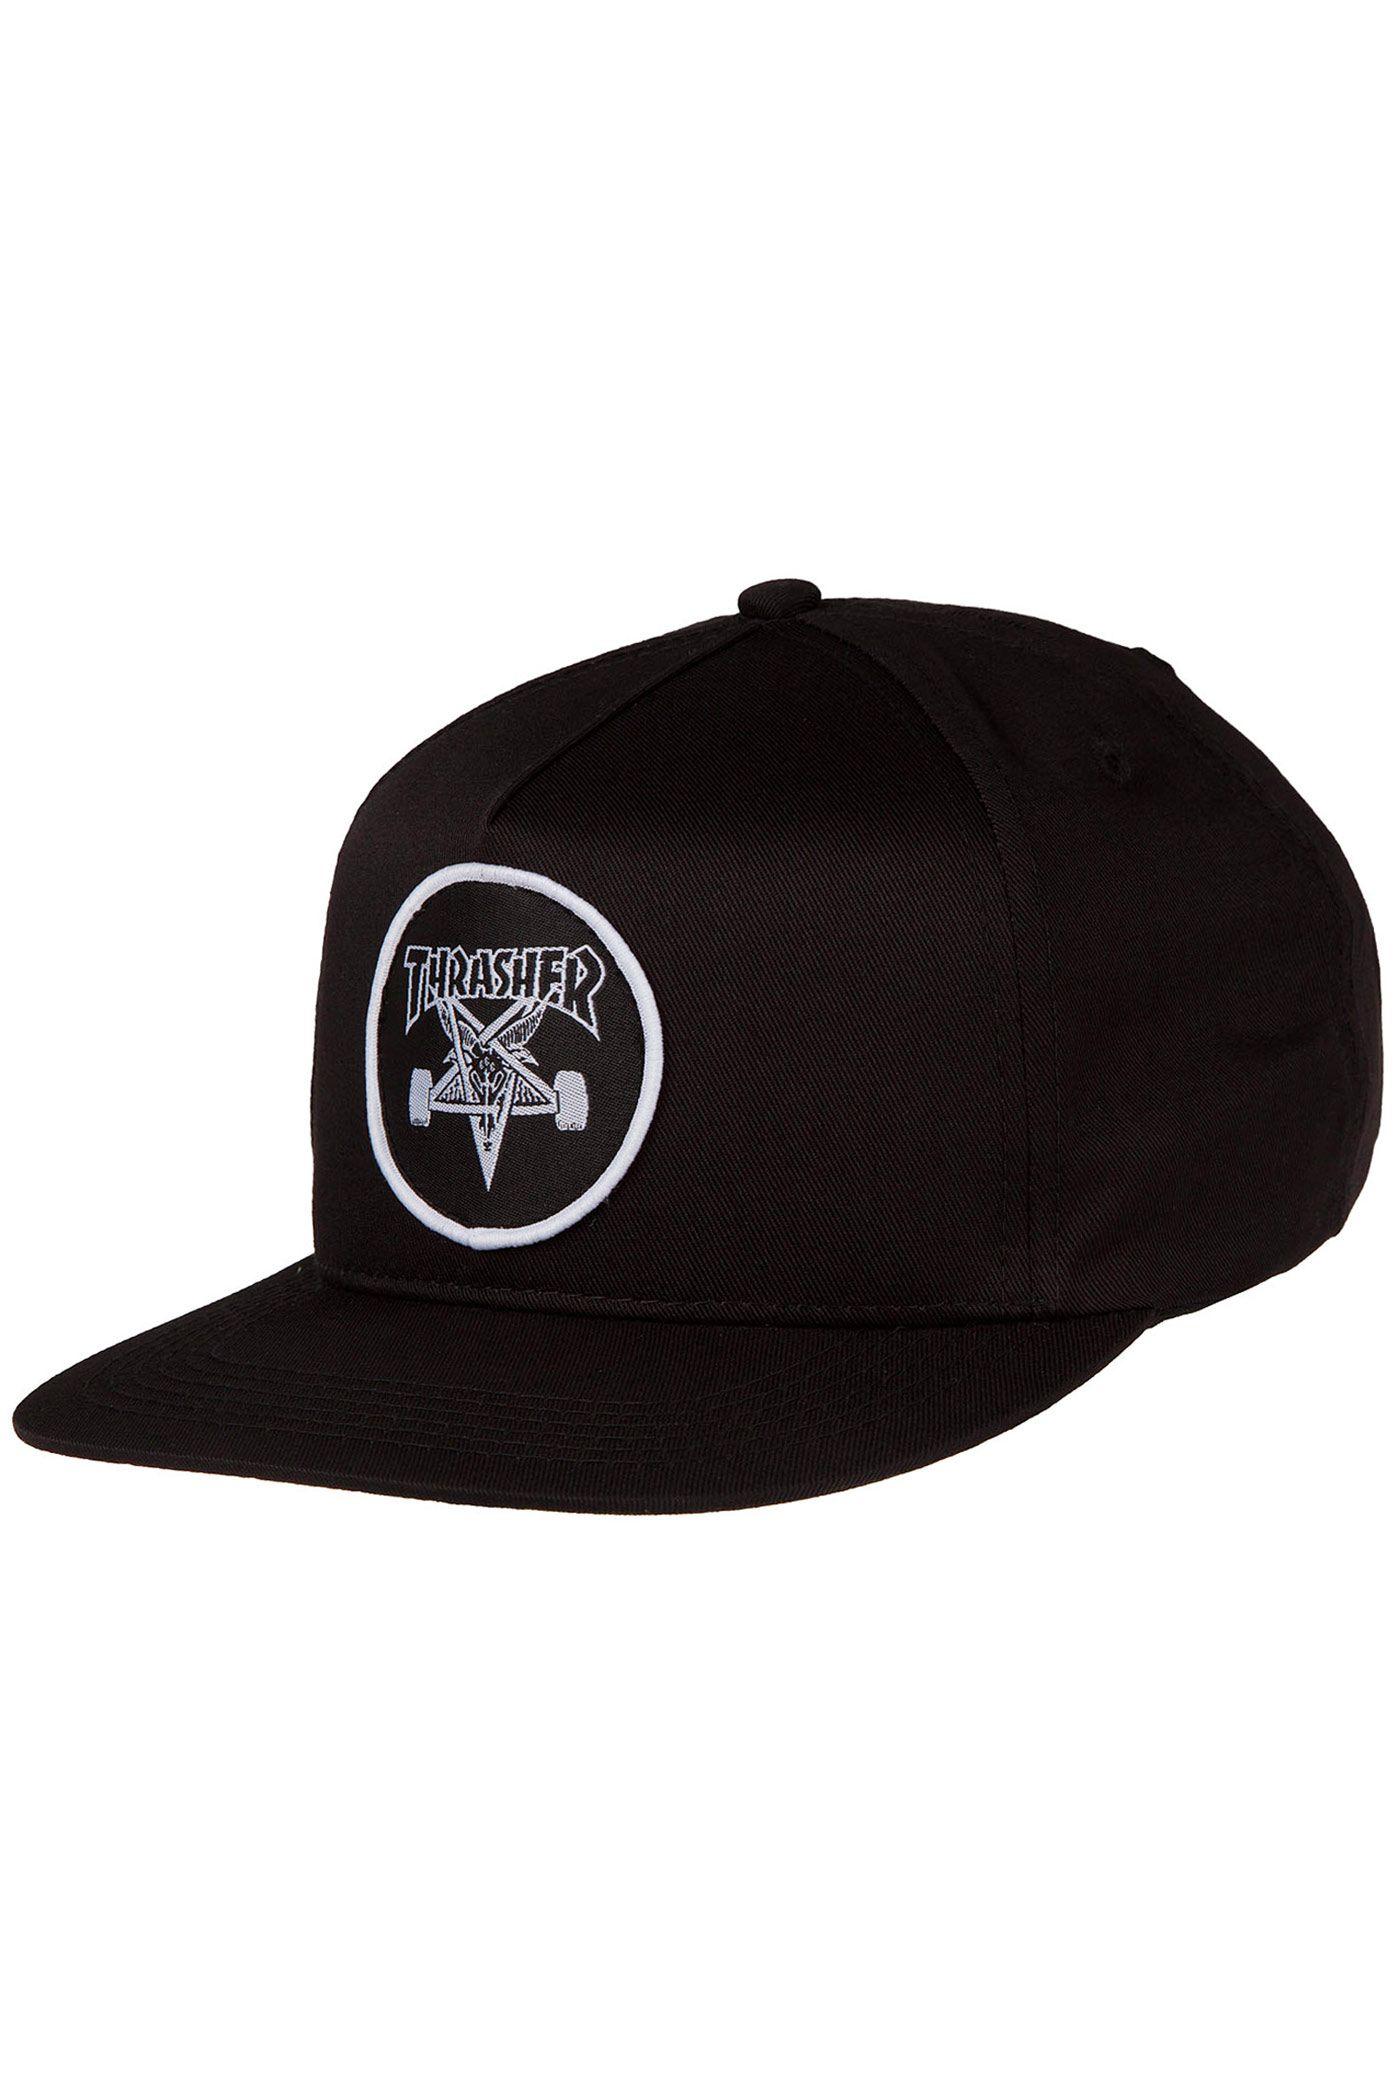 2f44ad607fd Thrasher Skate Goat Snapback Cap (black)